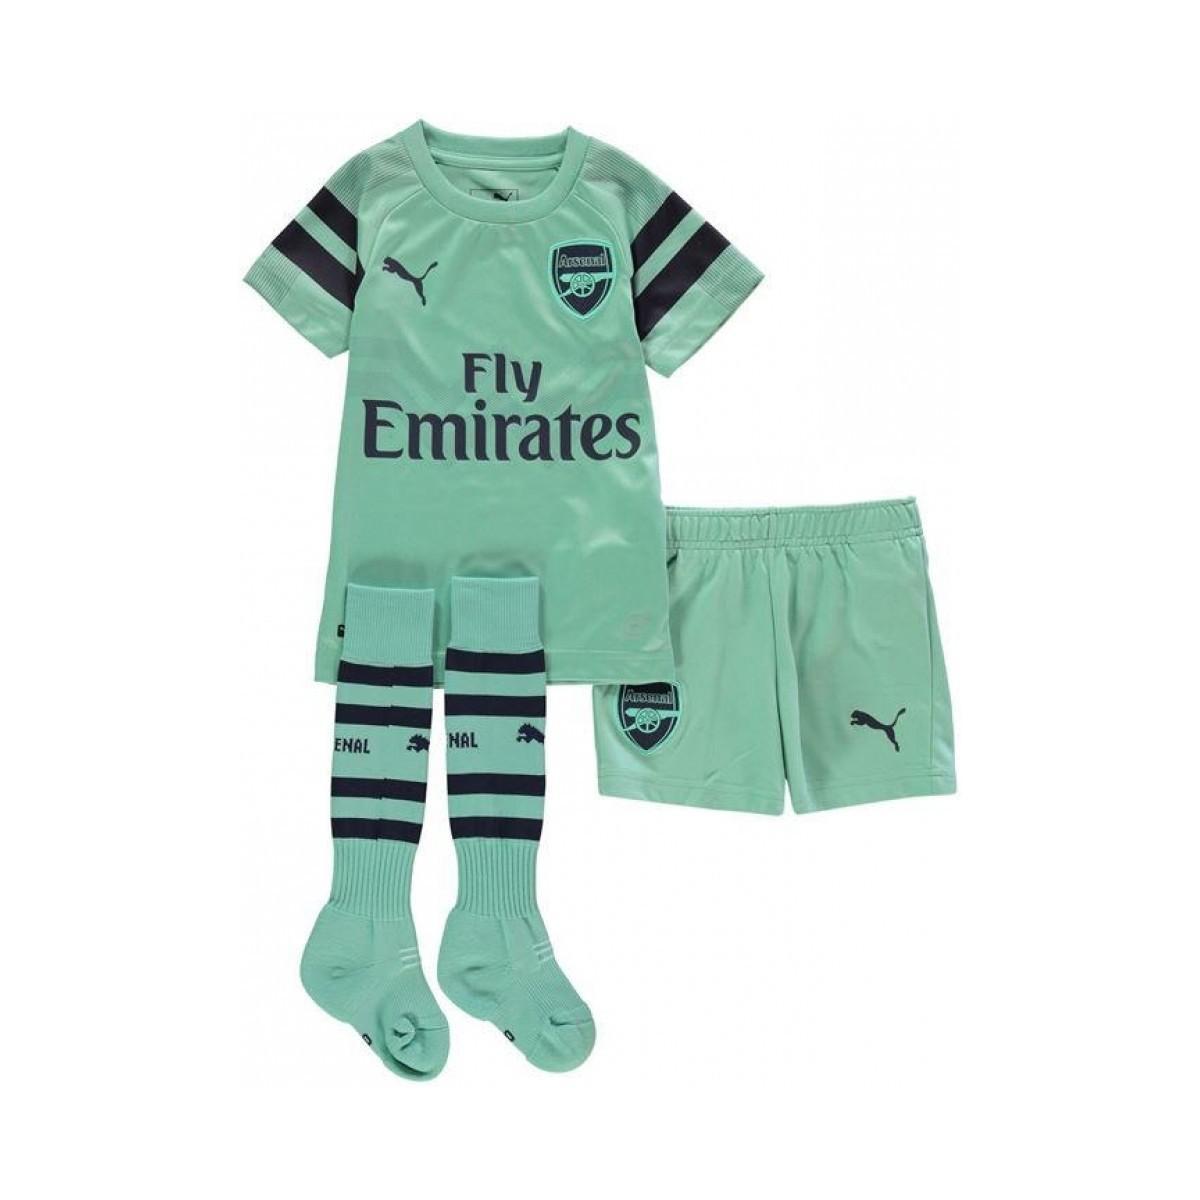 PUMA - 2018-2019 Arsenal Third Little Boys Mini Kit (mkhitaryan 7) Women s.  View fullscreen 74c83e5b2